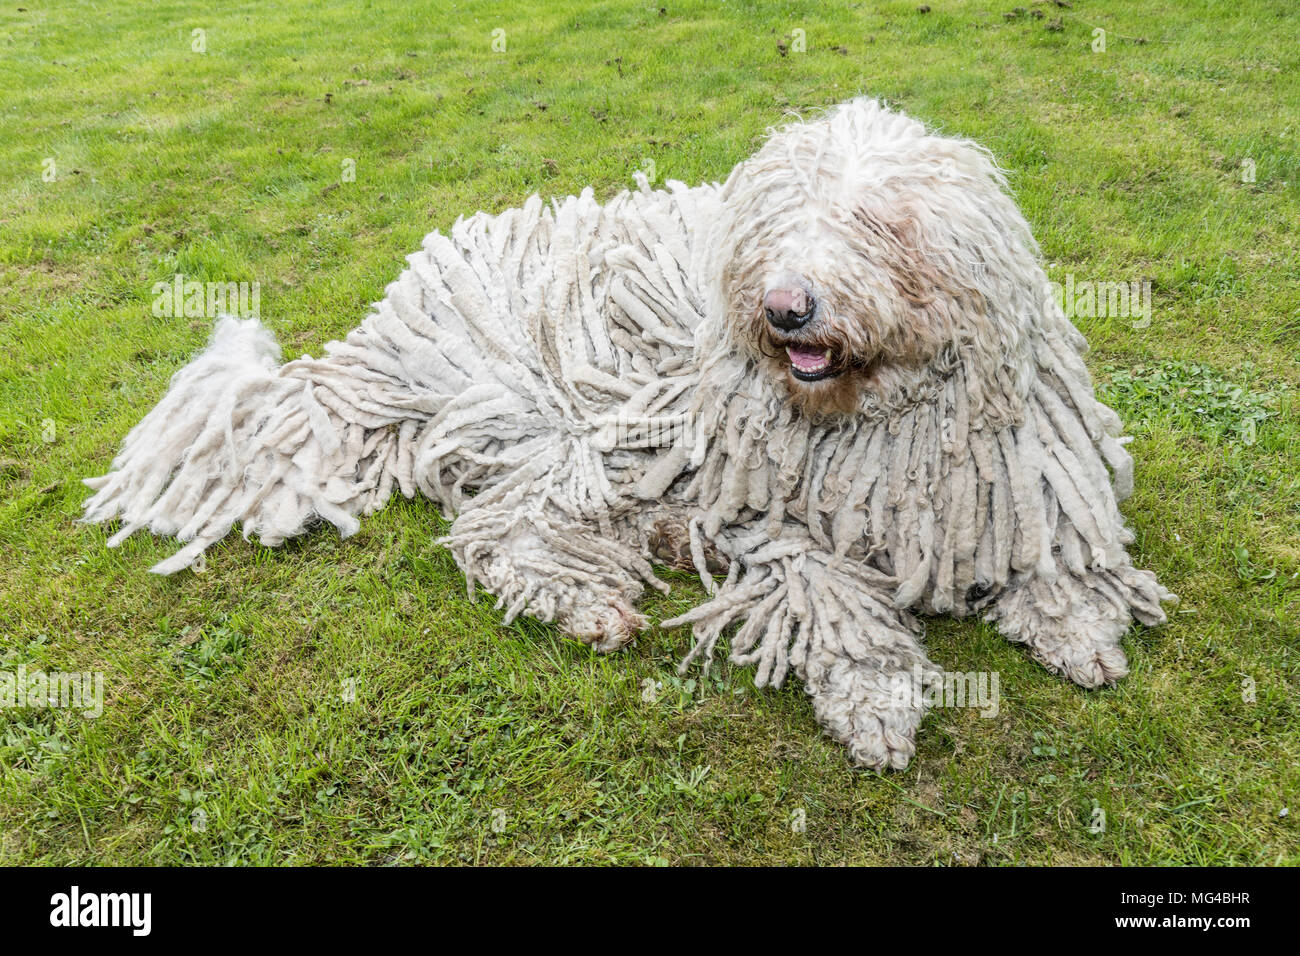 Big White Furry Dog Comodor In The Garden Komodor Dog Stock